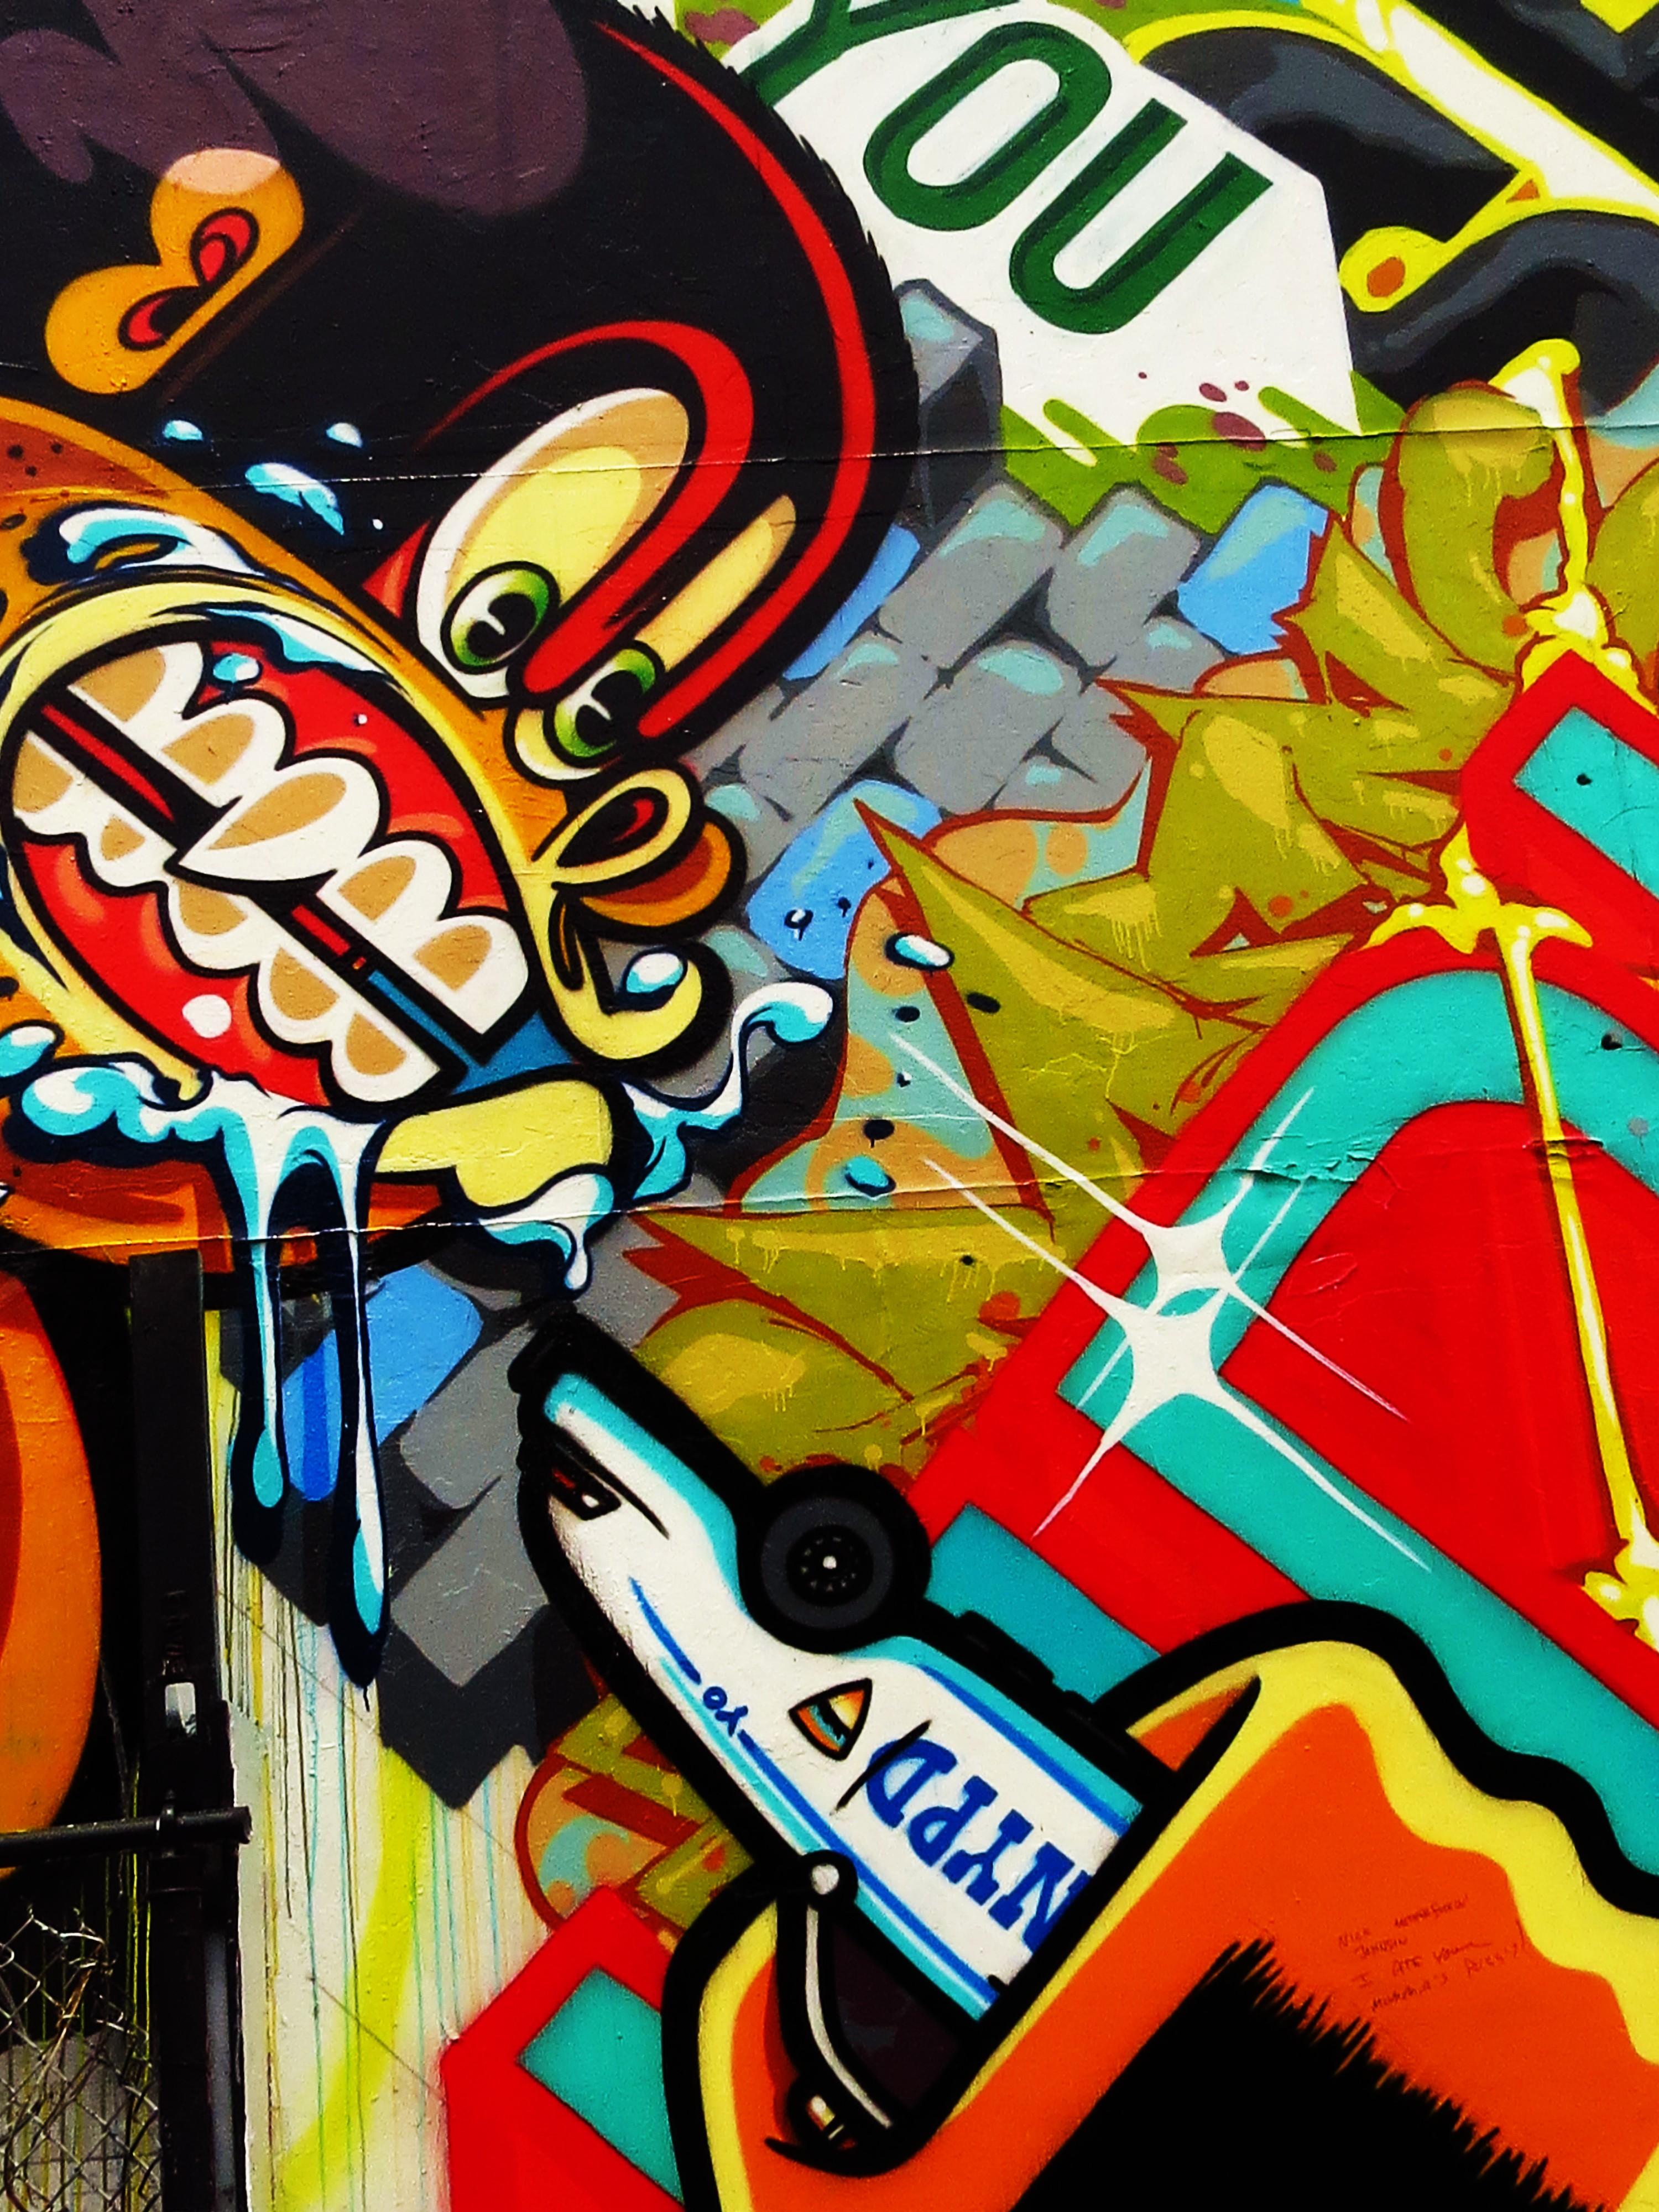 Revok and pose tokidoki nomad for Comic book mural